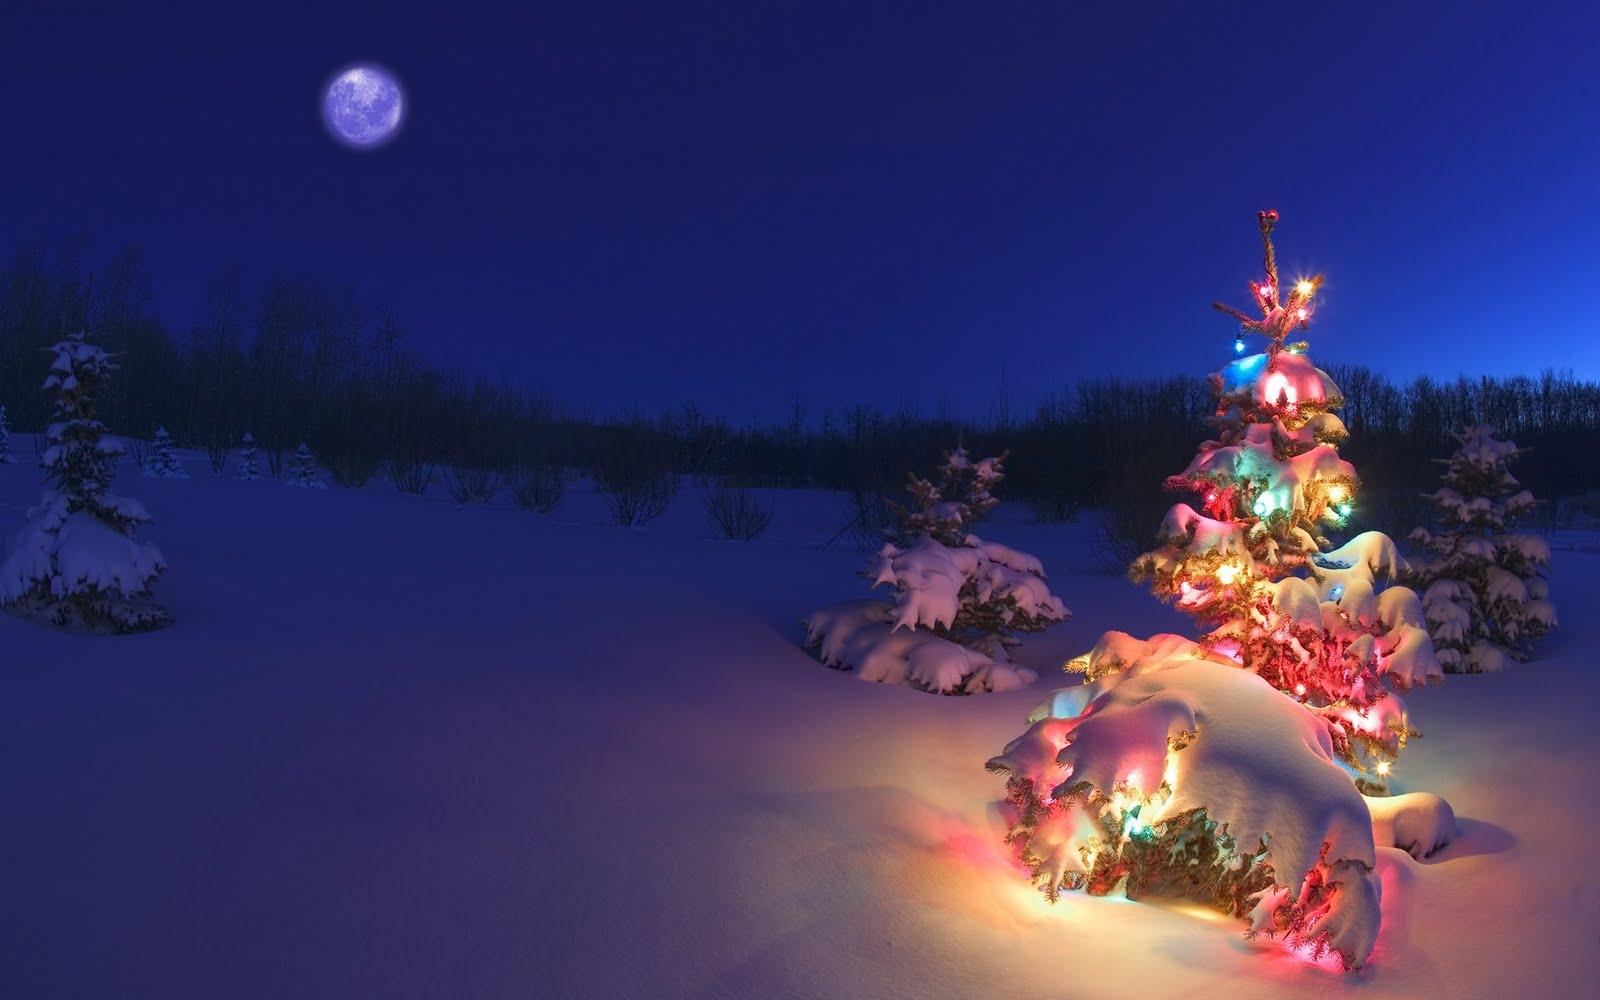 http://4.bp.blogspot.com/-9tsM-1uqO2E/TtV0aSkfYjI/AAAAAAAArtc/yTIefQKbOqc/s1600/arbol-de-navidad-christmas-tree-1920x1200-wallpaper.jpg